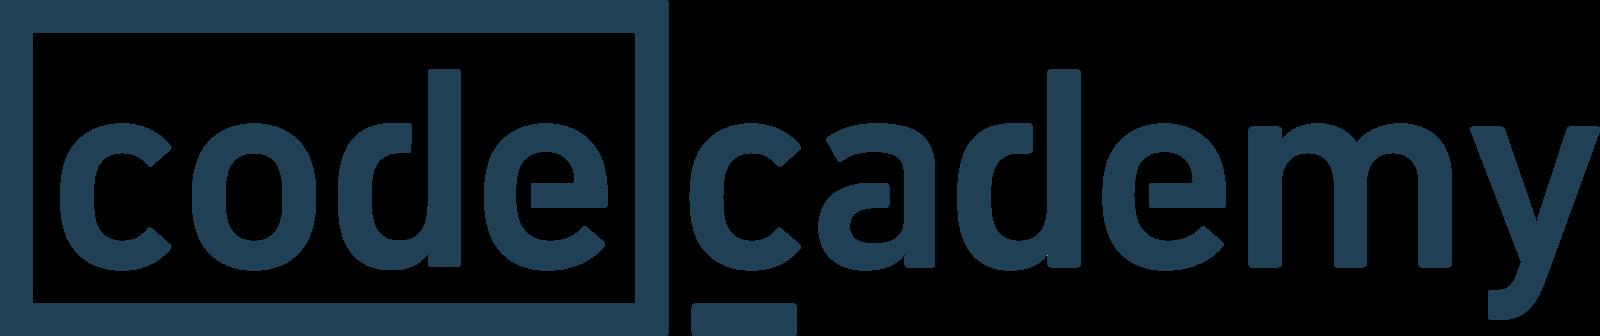 codecademy - 5 Website yang Nyaman untuk Belajar Bahasa Pemrograman/Koding (HTML, CSS, Java, Ruby, dll)